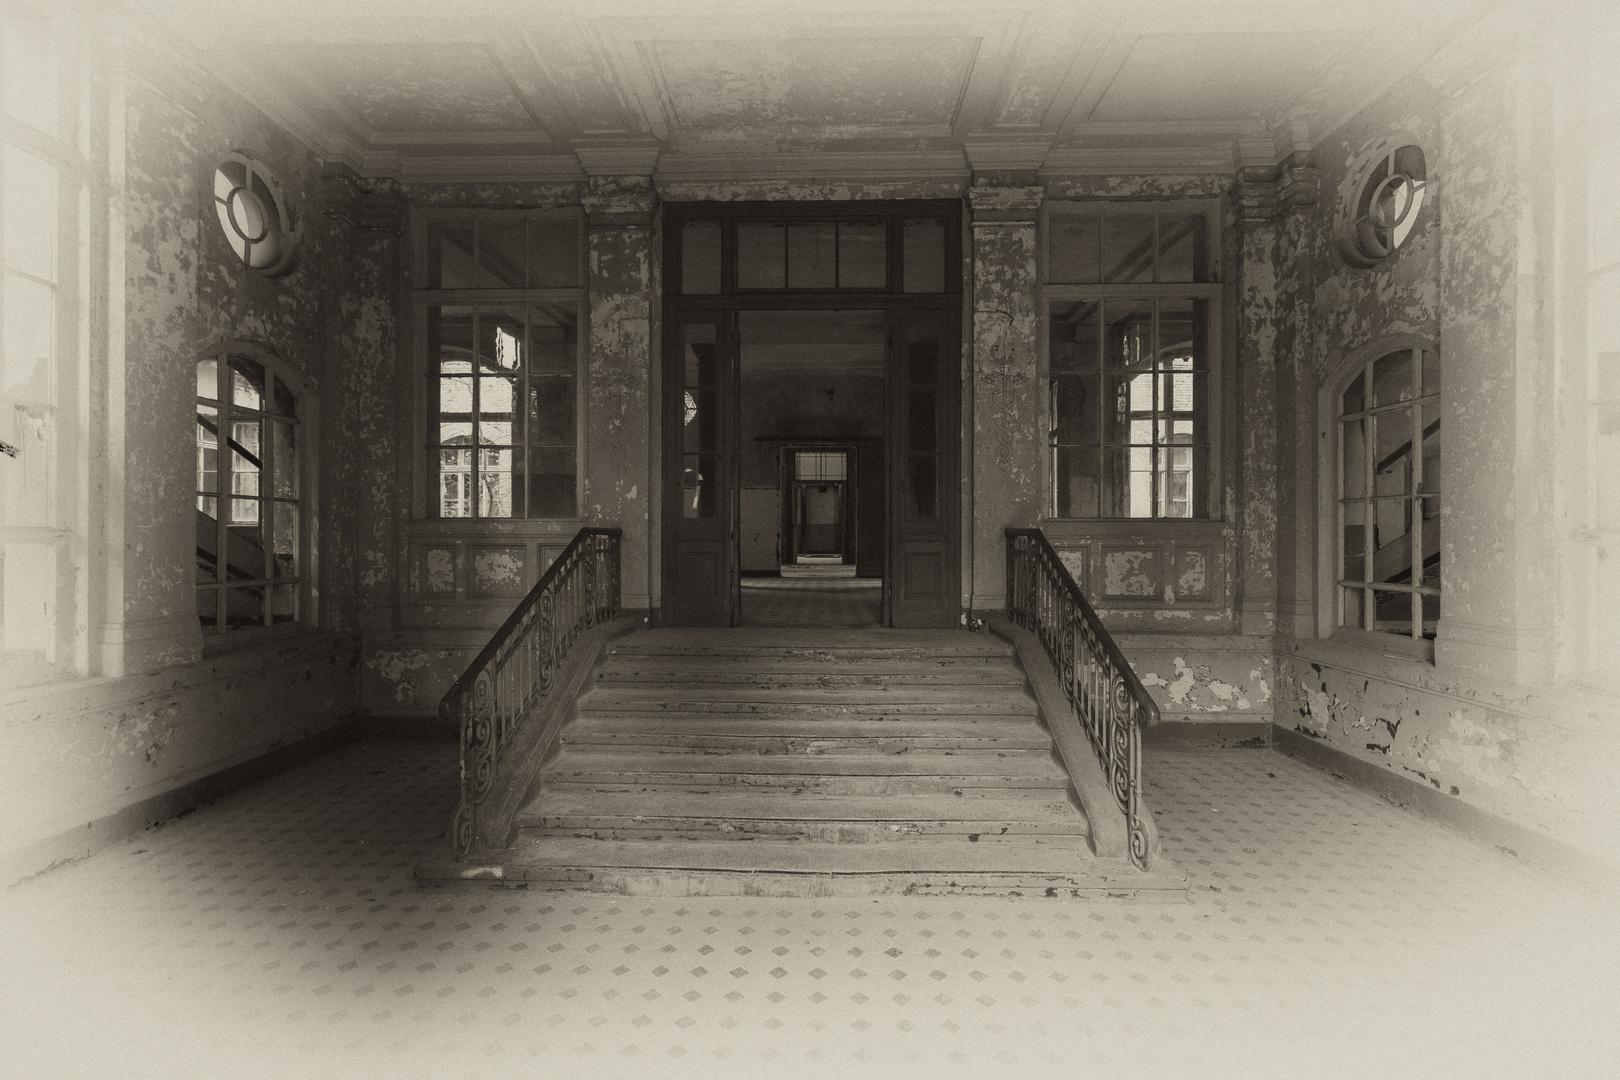 Beelitz Heilstätten - Männersanatorium Zentralbadeanstalt (6)